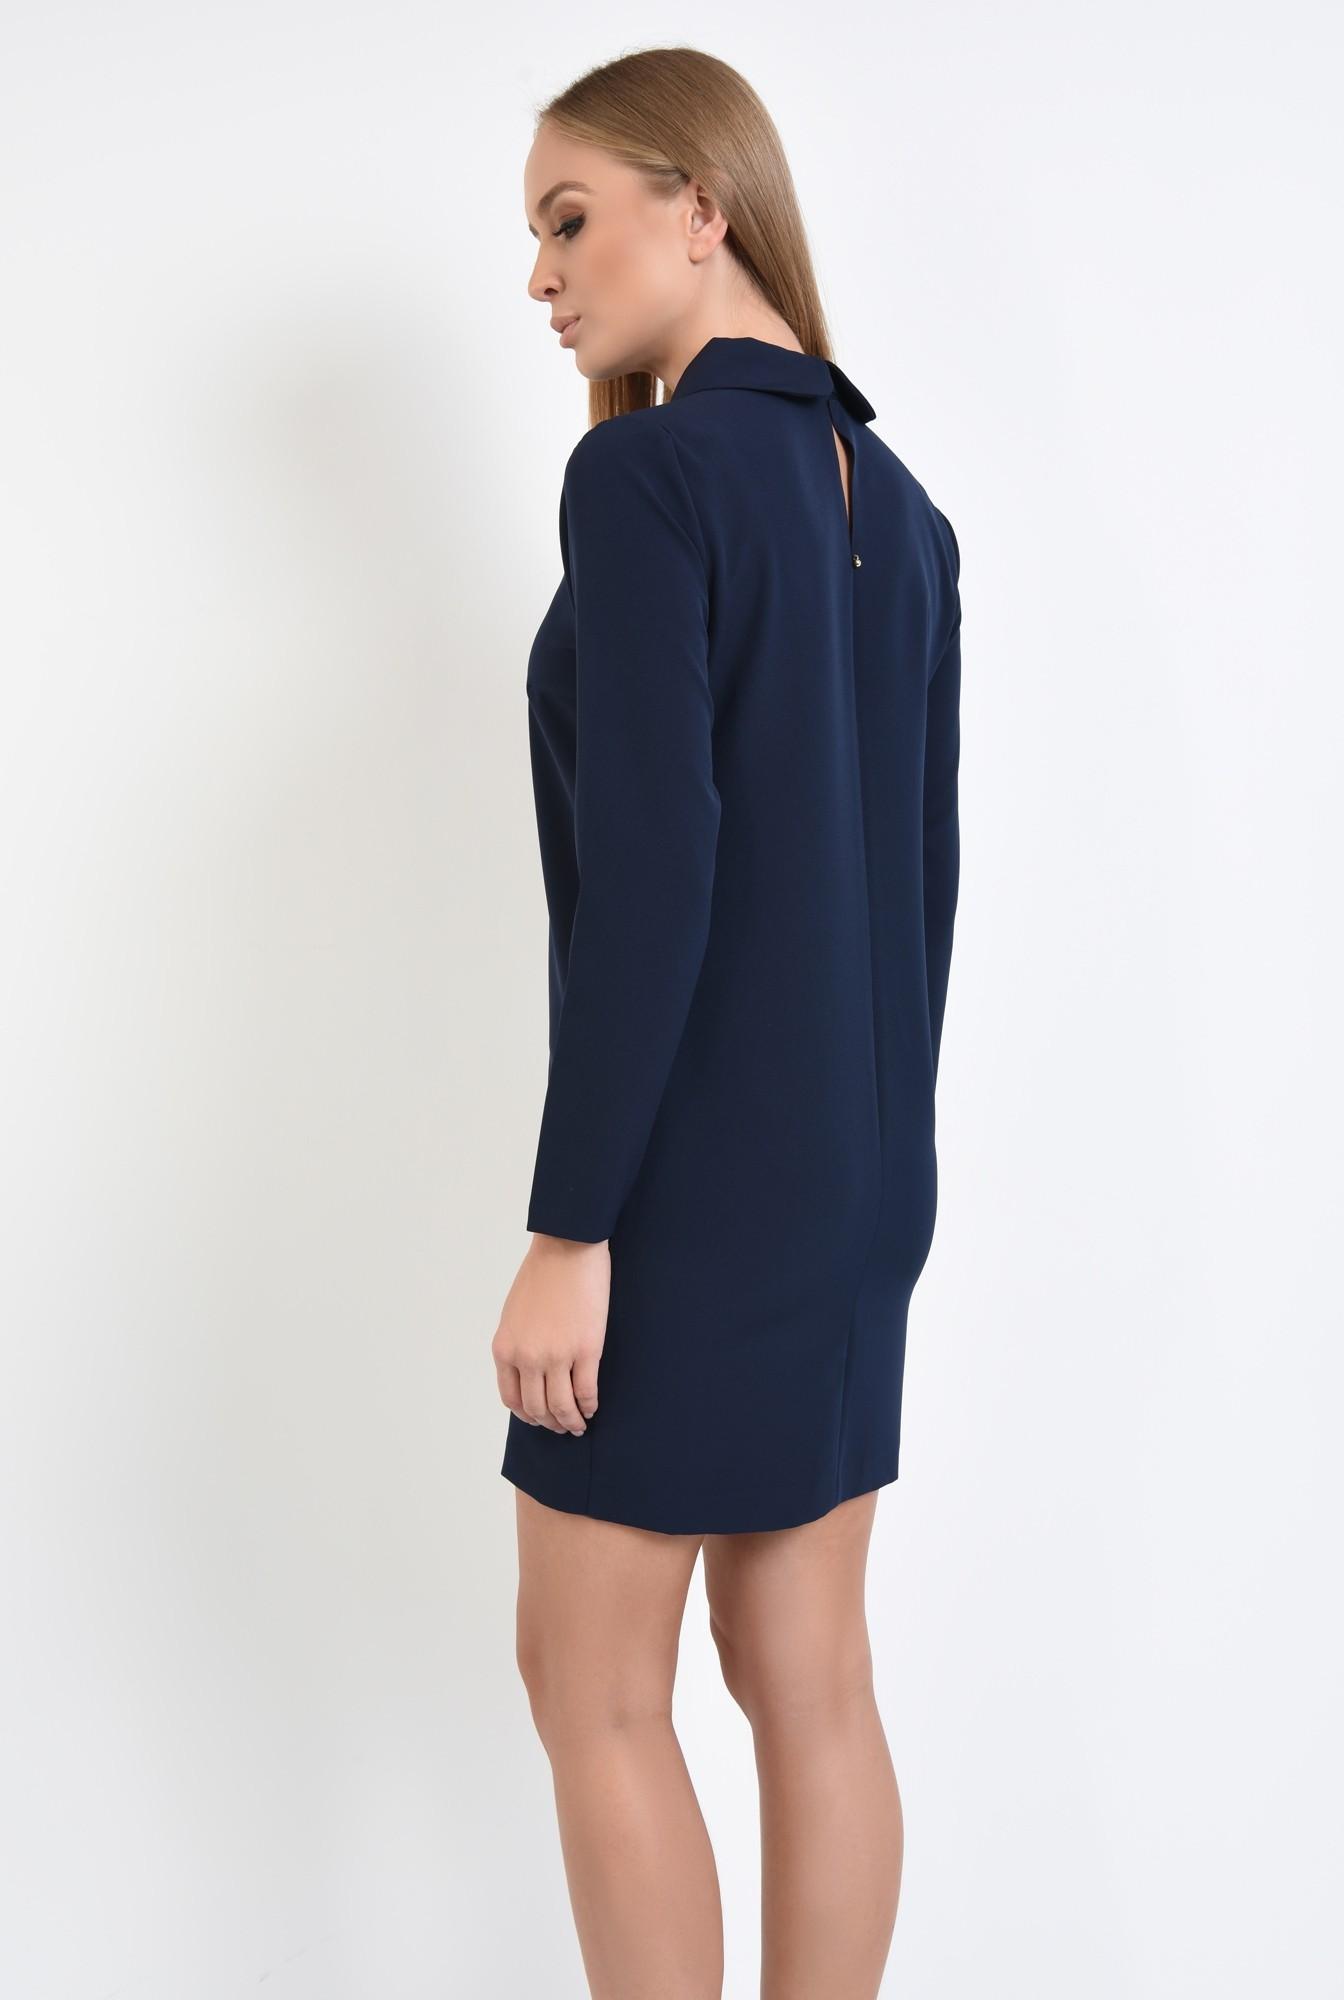 1 - rochie de zi, scurta, bleumarin, maneci lungi